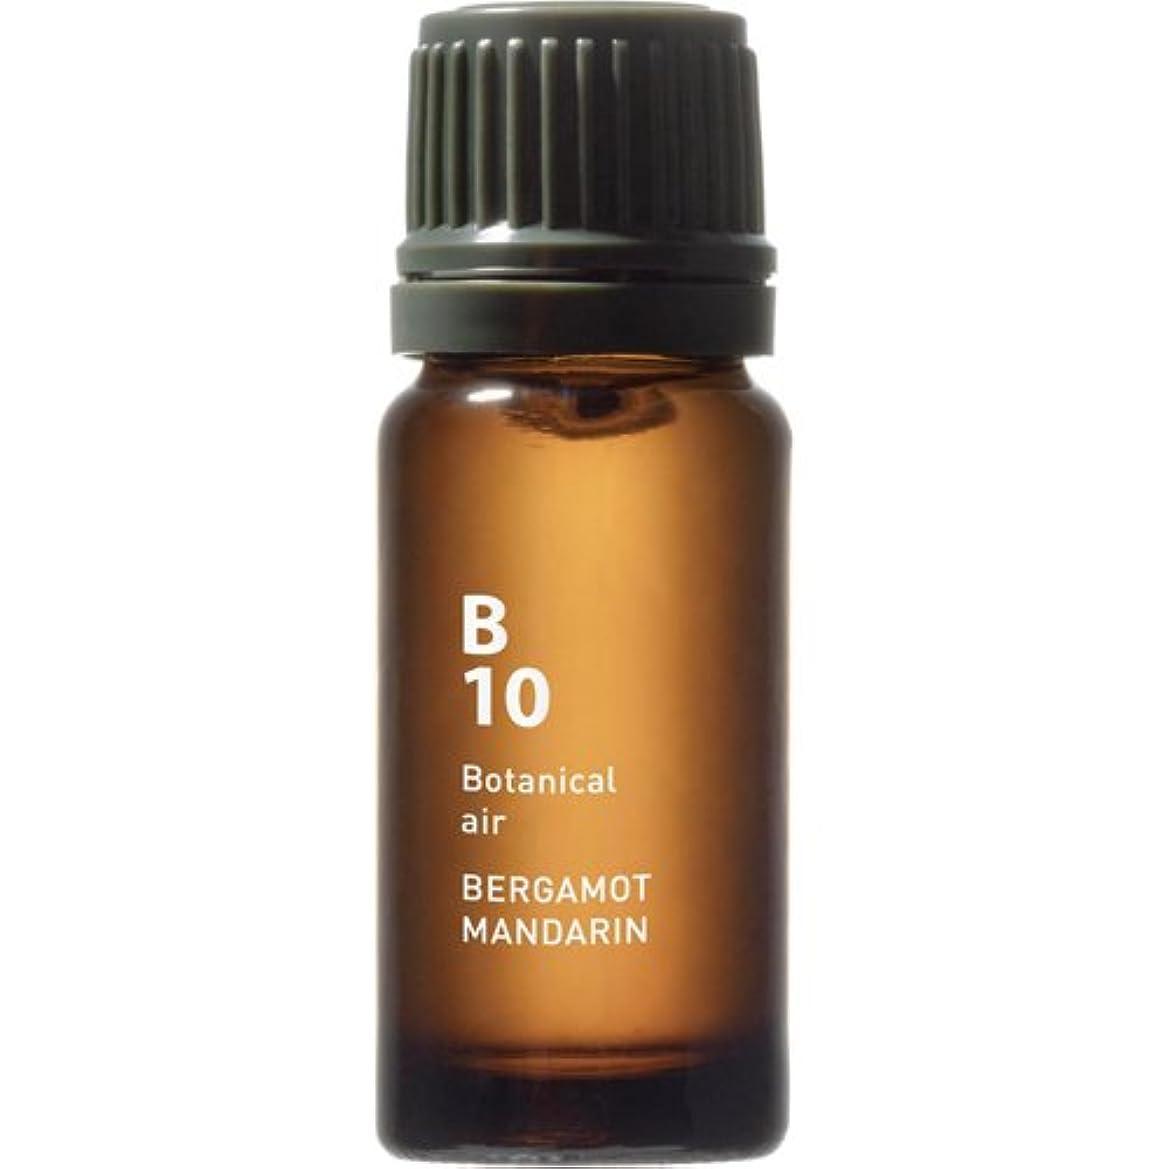 B10 ベルガモットマンダリン Botanical air(ボタニカルエアー) 10ml